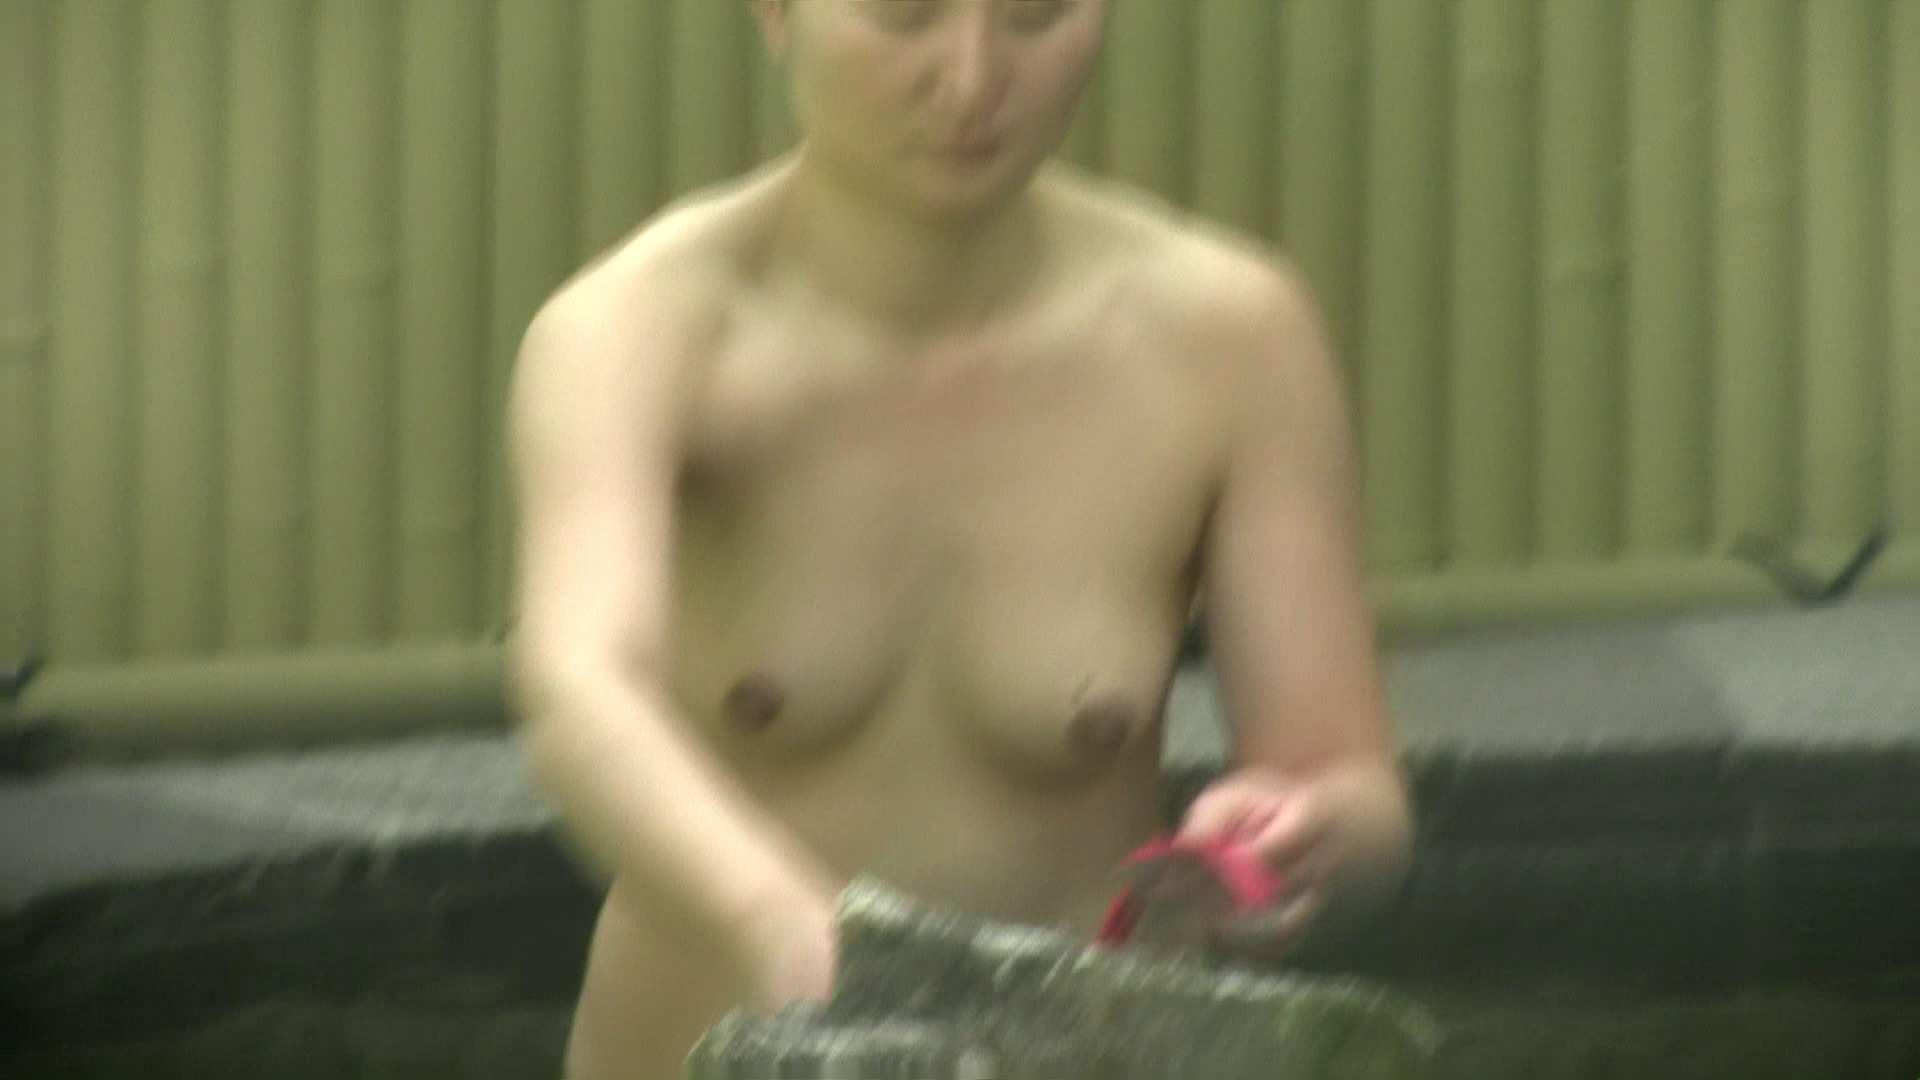 Aquaな露天風呂Vol.632 盗撮シリーズ | 露天風呂編  100PIX 1